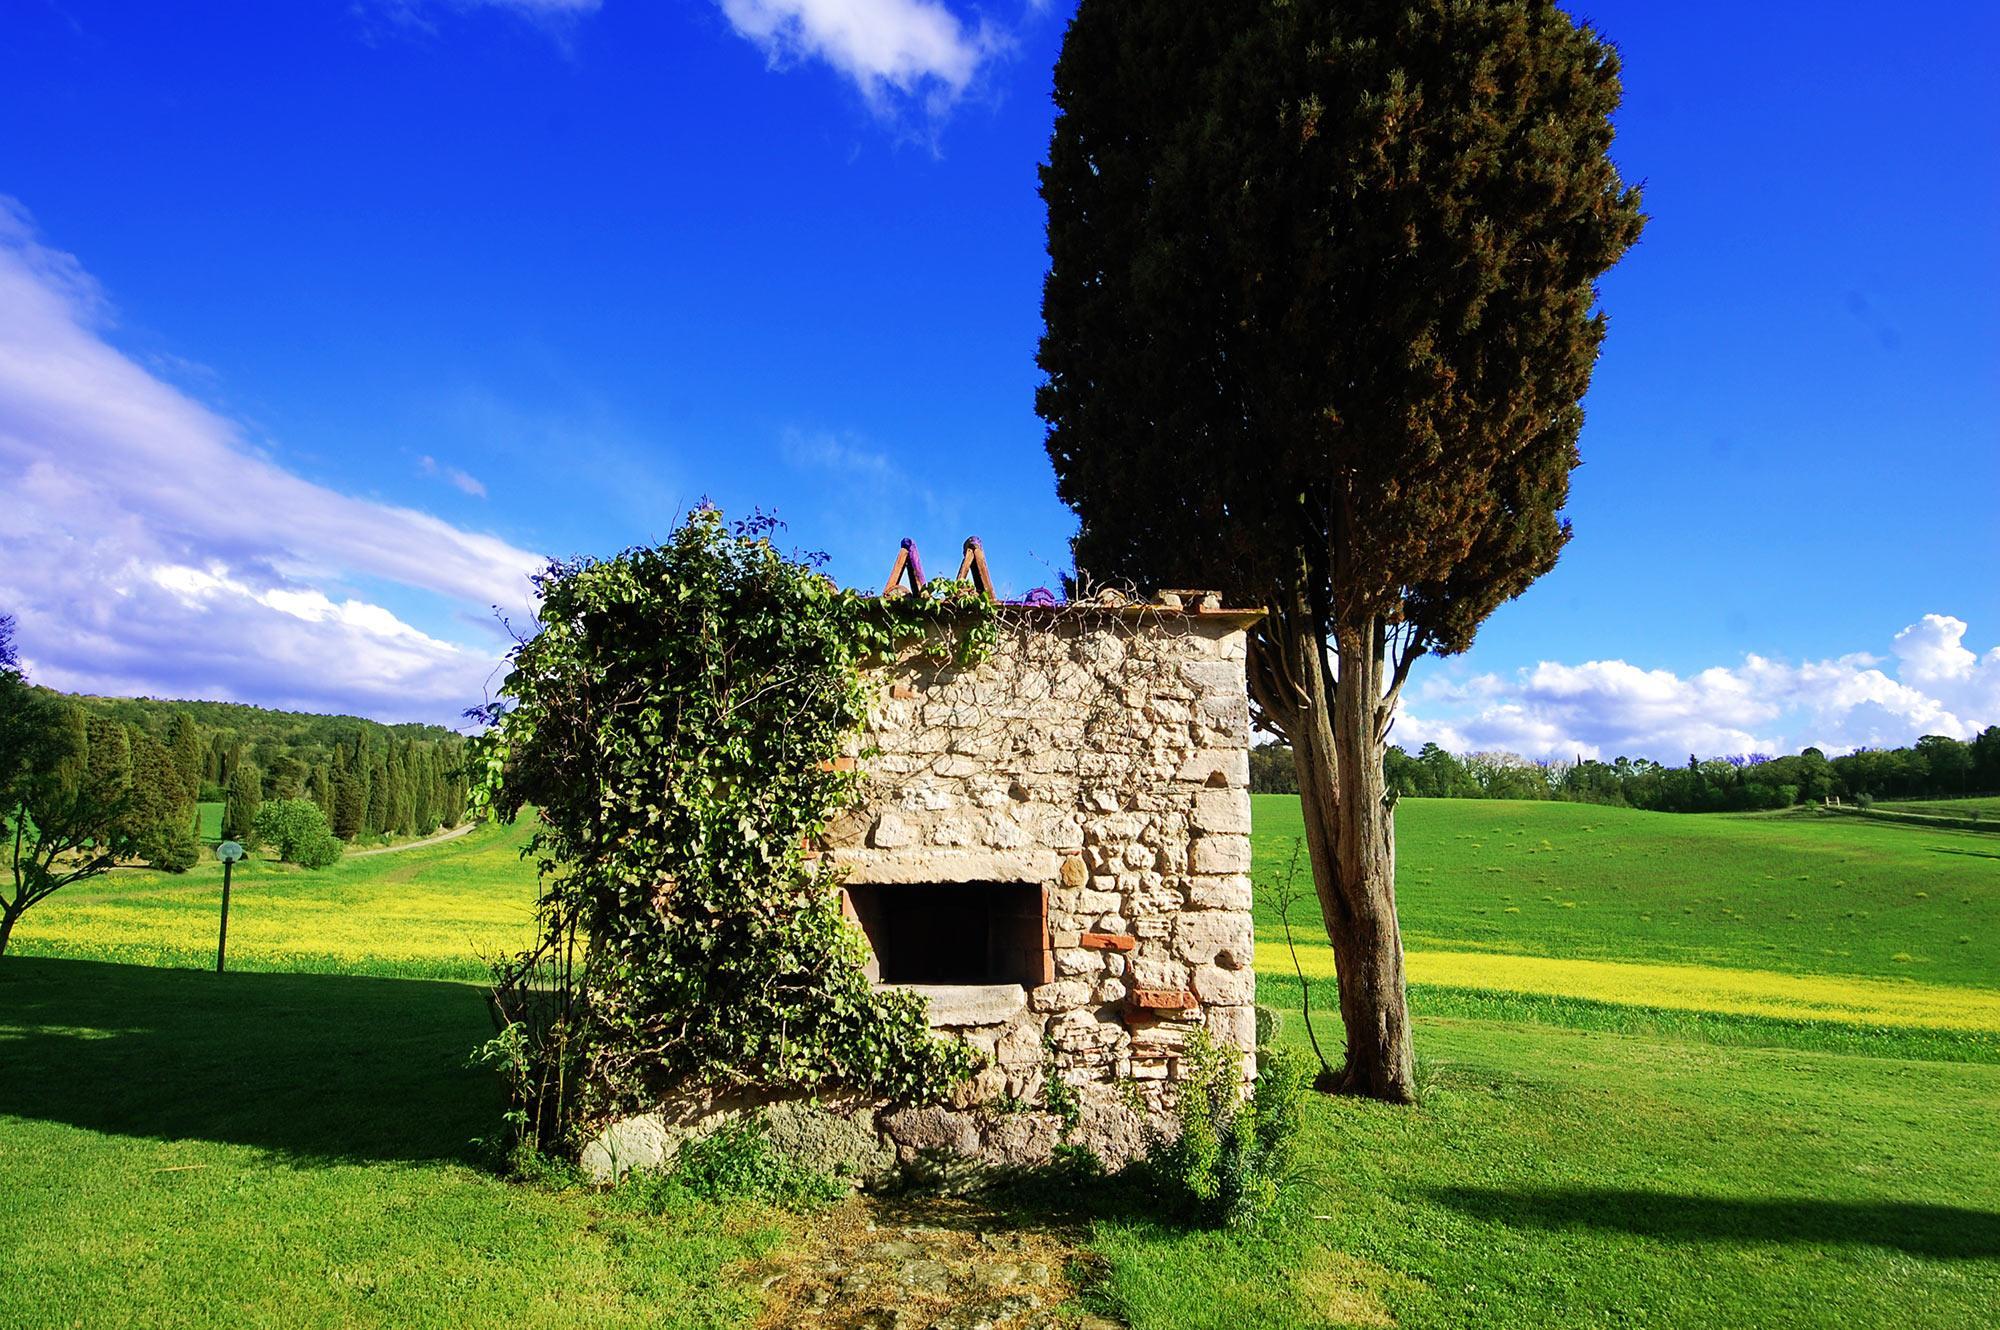 stono oven of tuscan villa